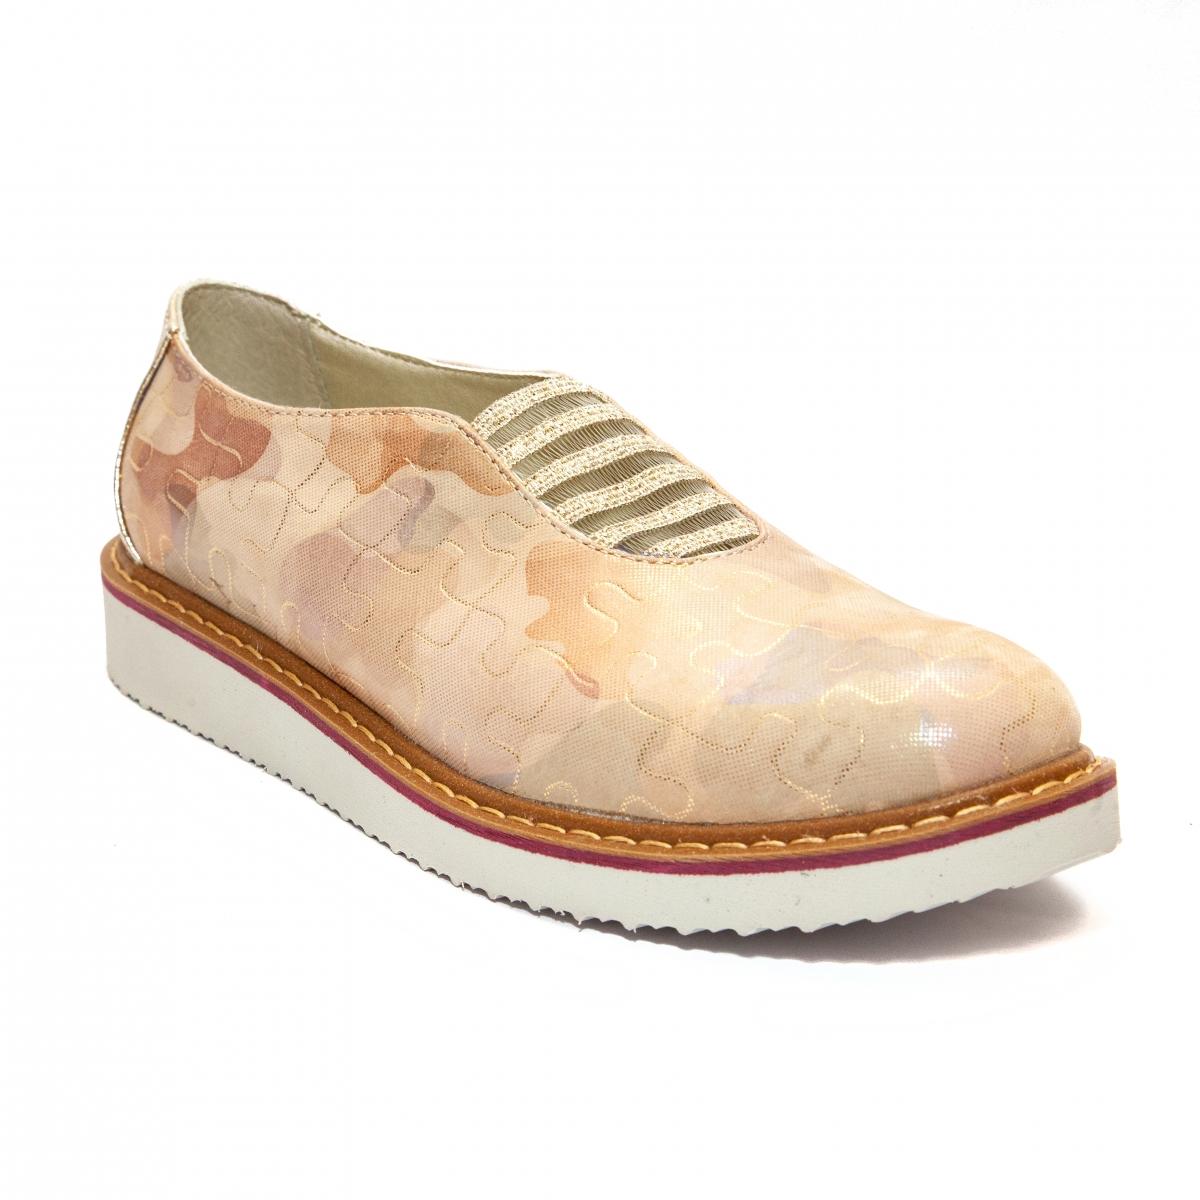 Pantofi dama piele 1905 bej roz auriu 26-40